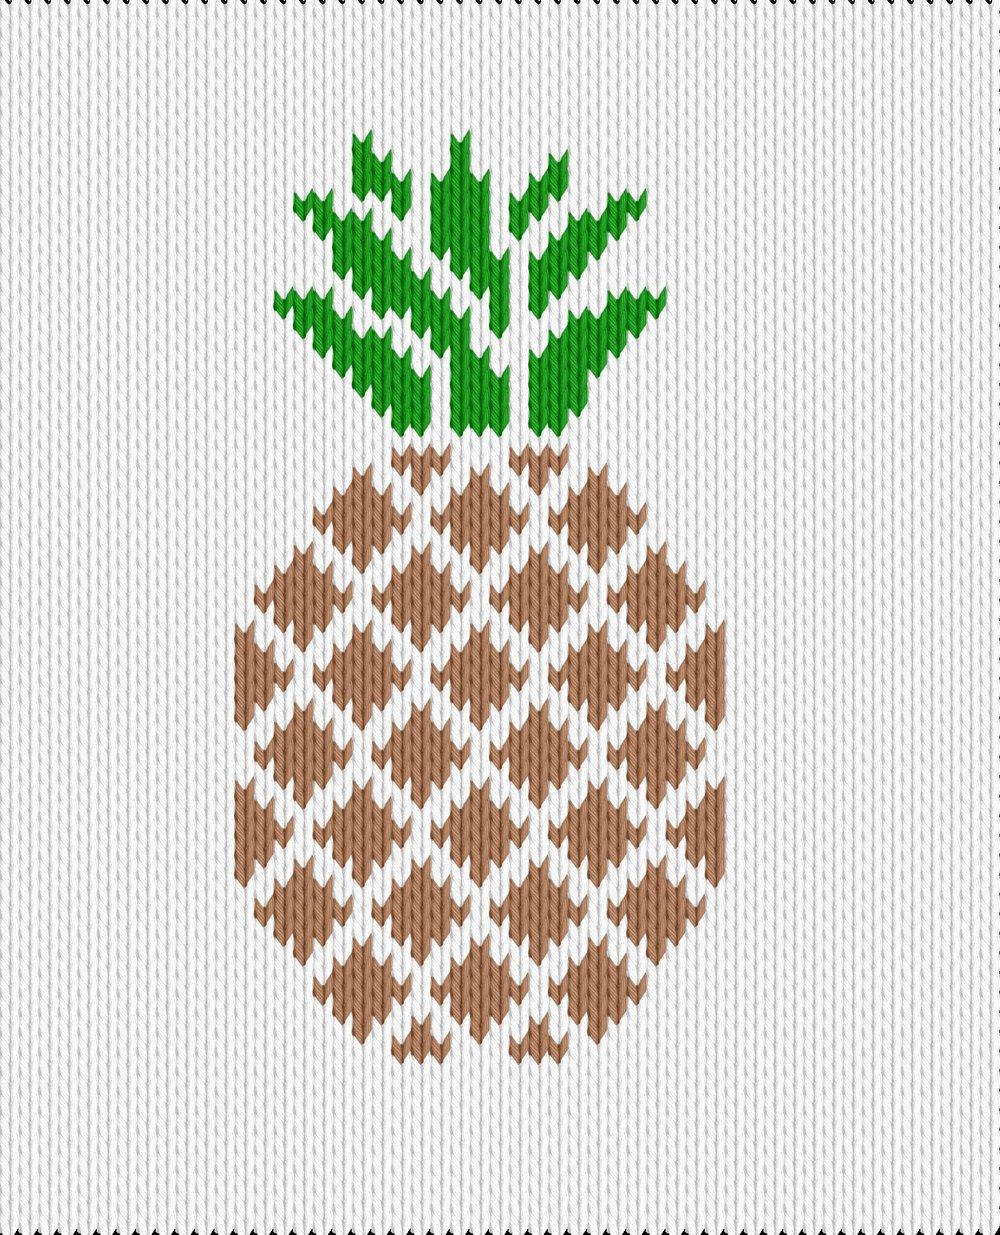 Knitting motif chart, pineapple